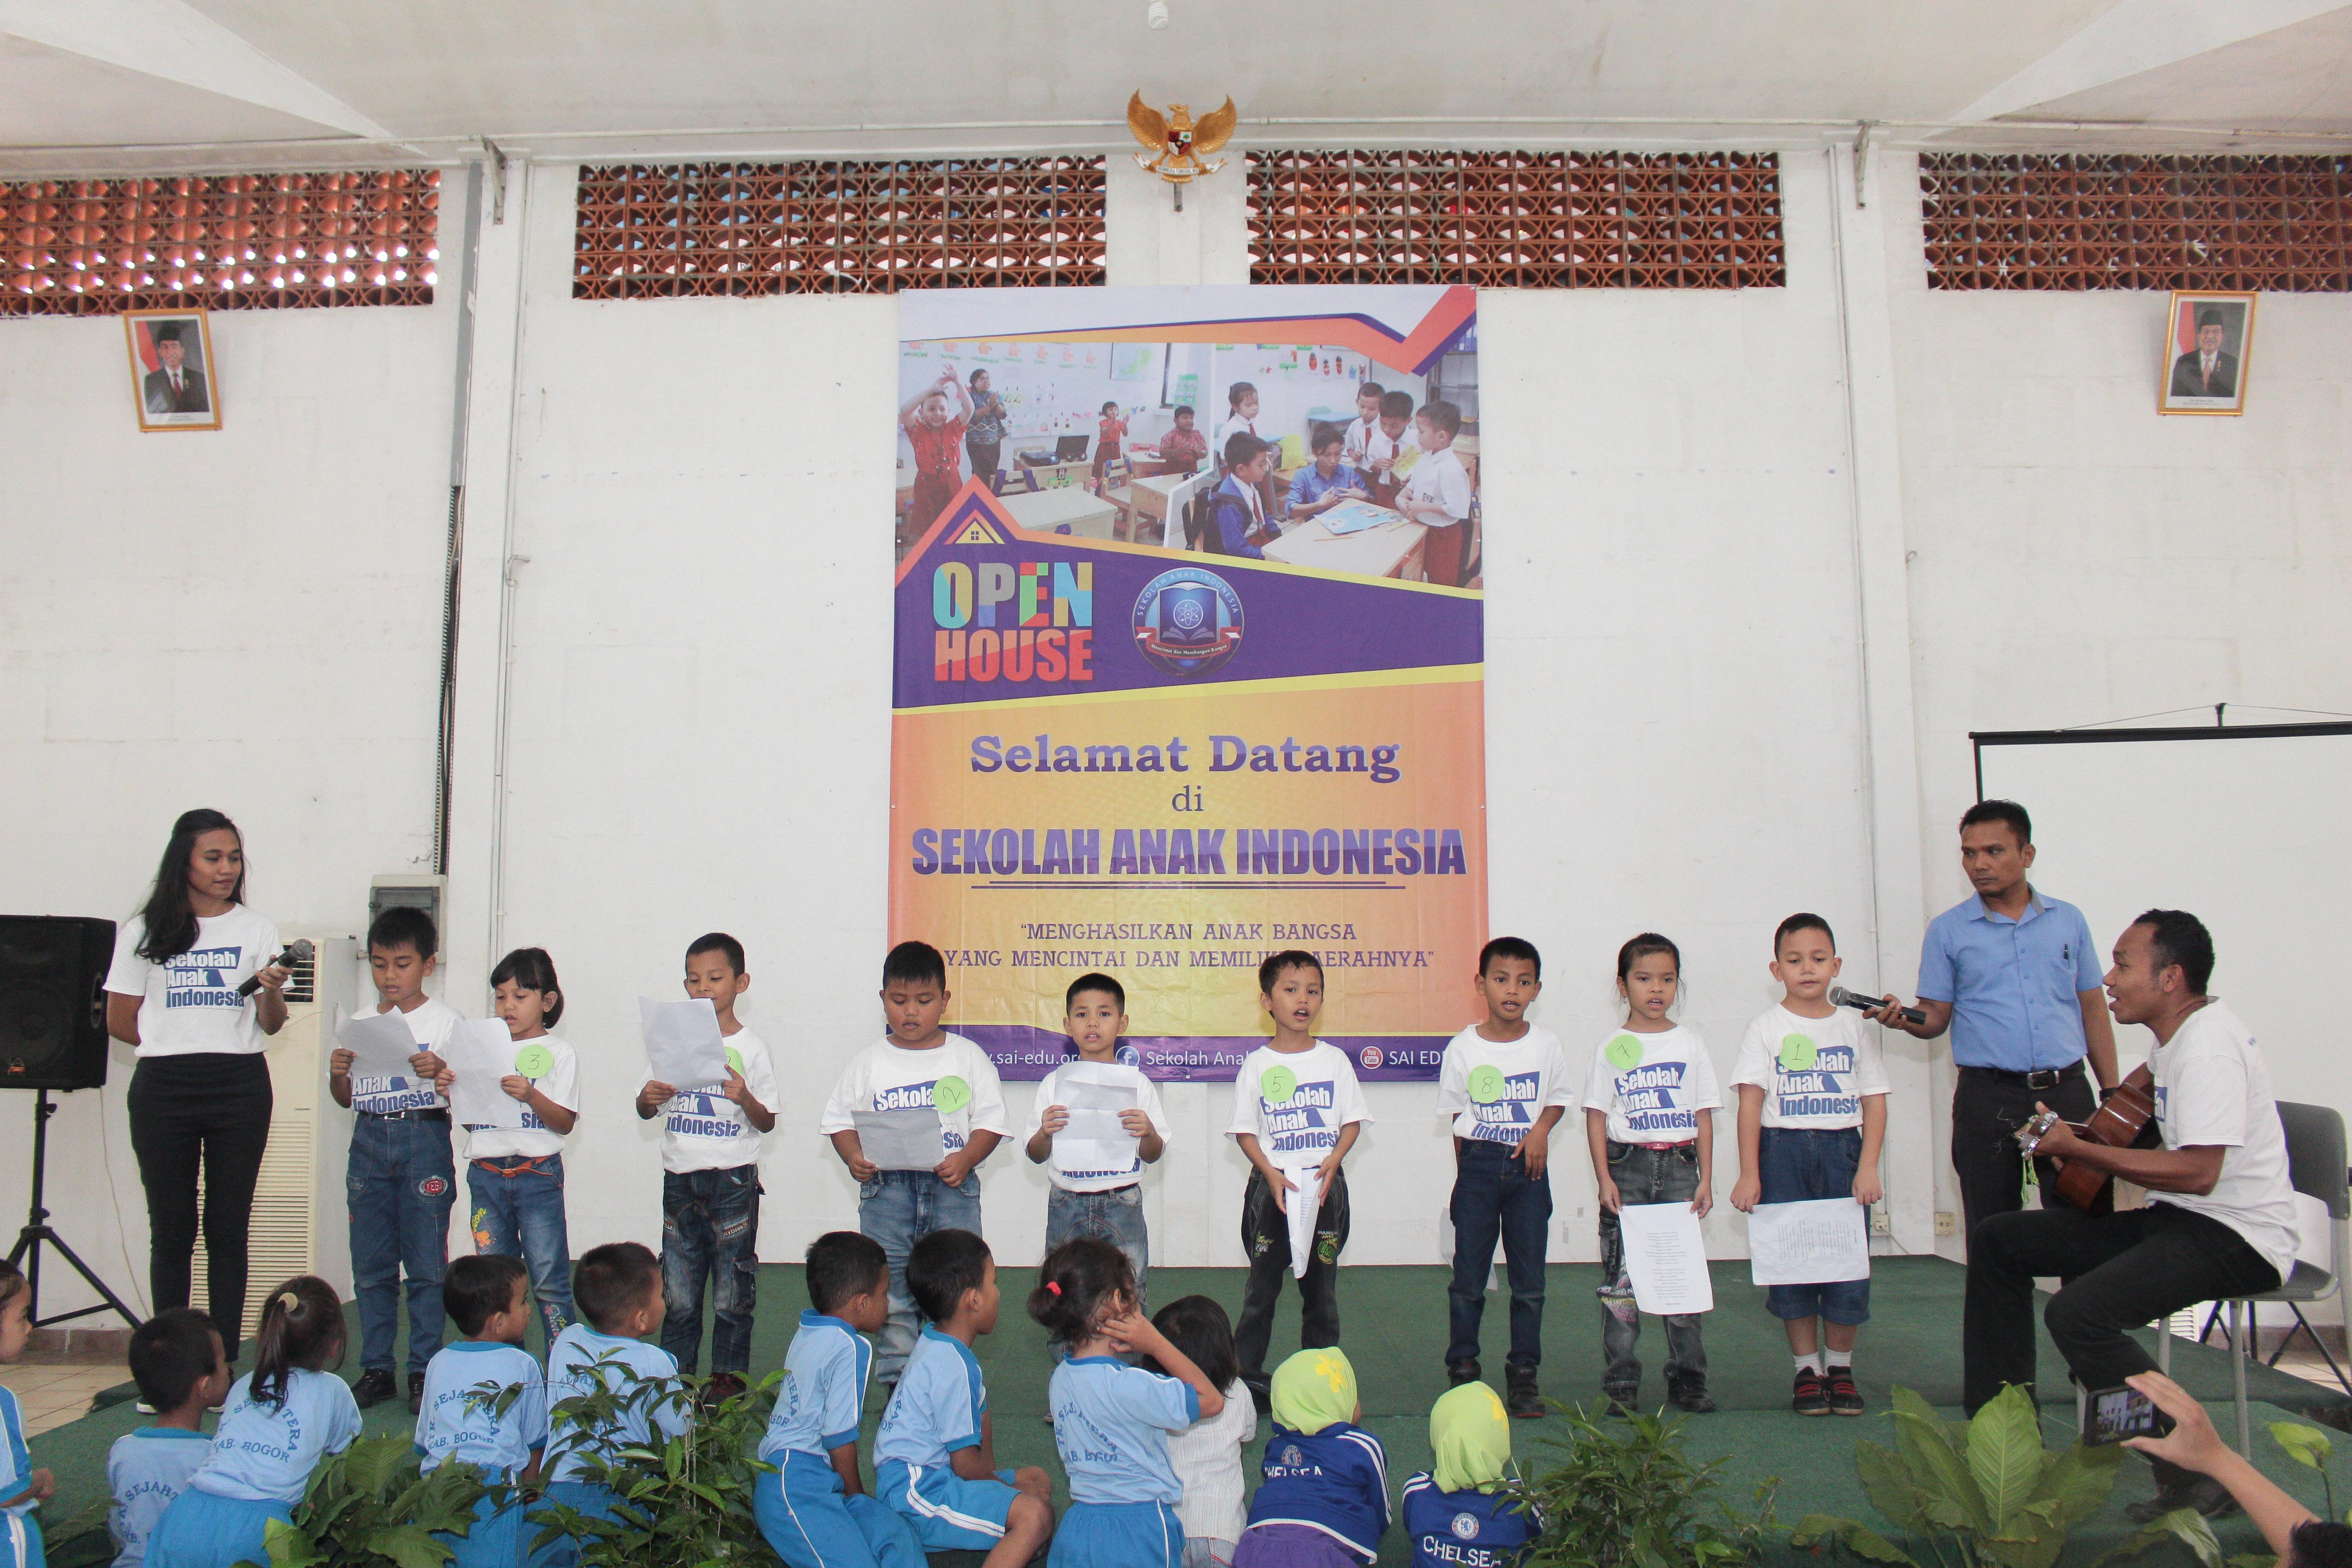 sekolah anak indoensia-sekolah Papua-lomba mewarnai-lomba menggambar_ sekolah papua di sentul-sekolah anak papua-sekolah hebat-pertunjunkan anak papua